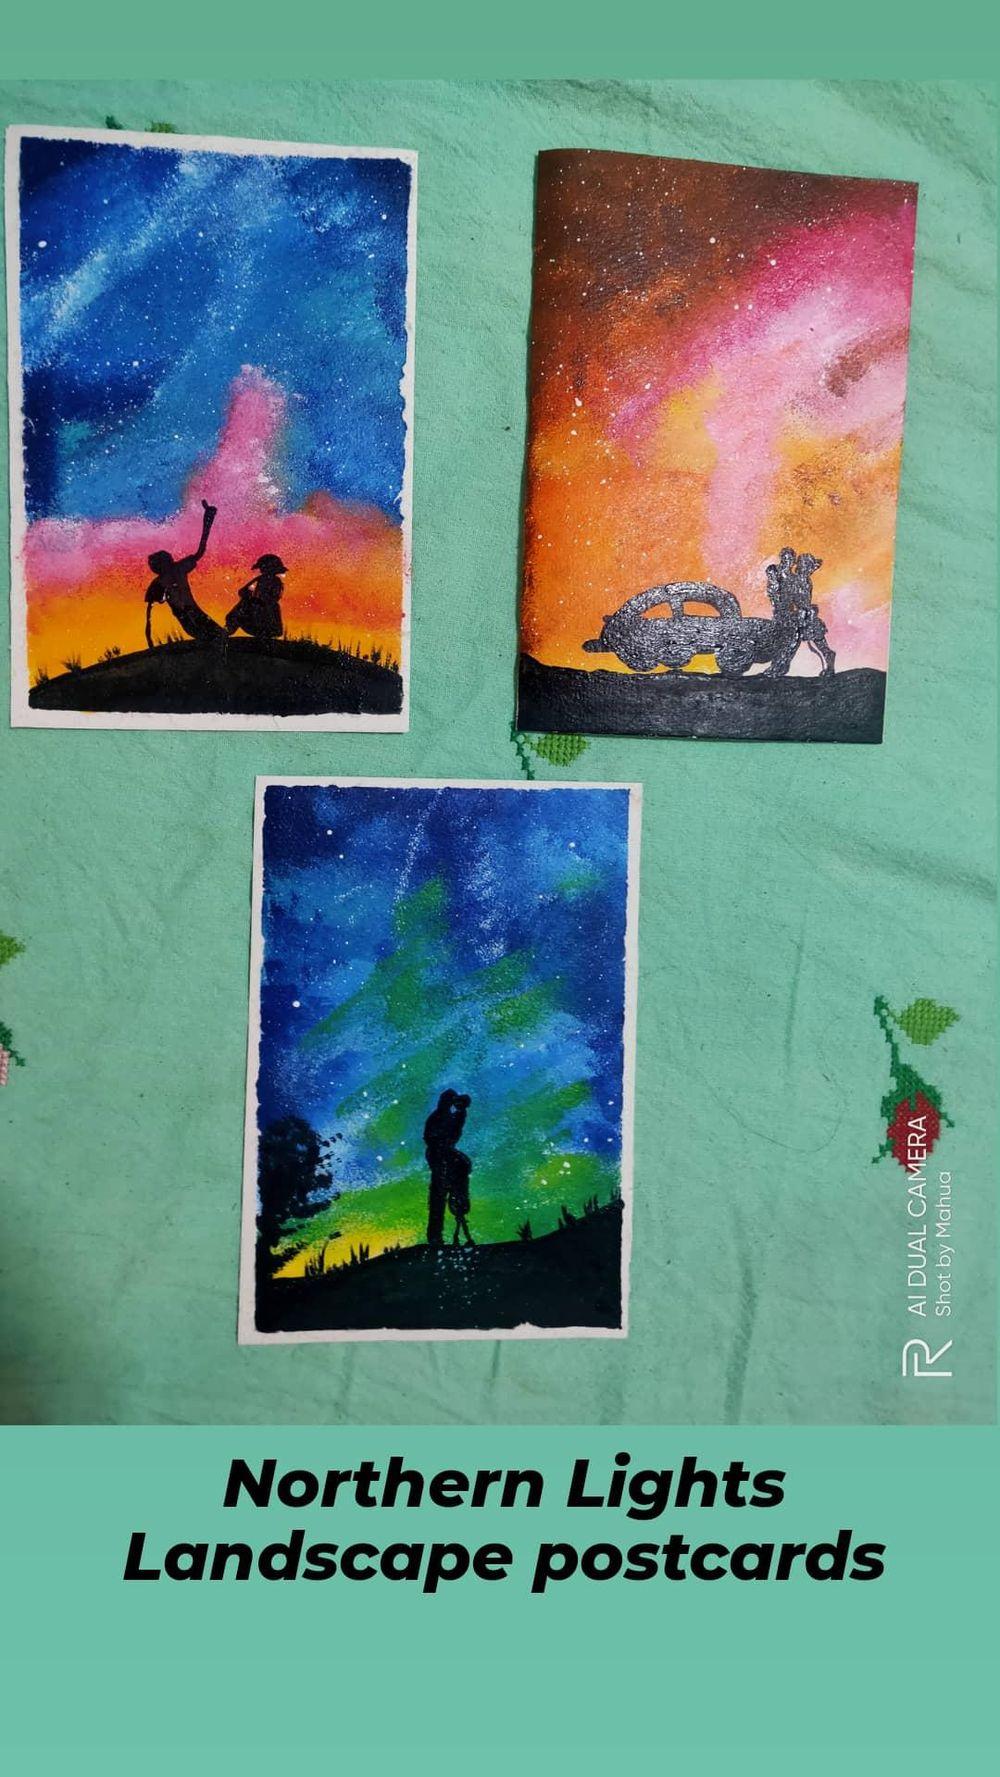 Romantic Sponge Paintings - image 1 - student project